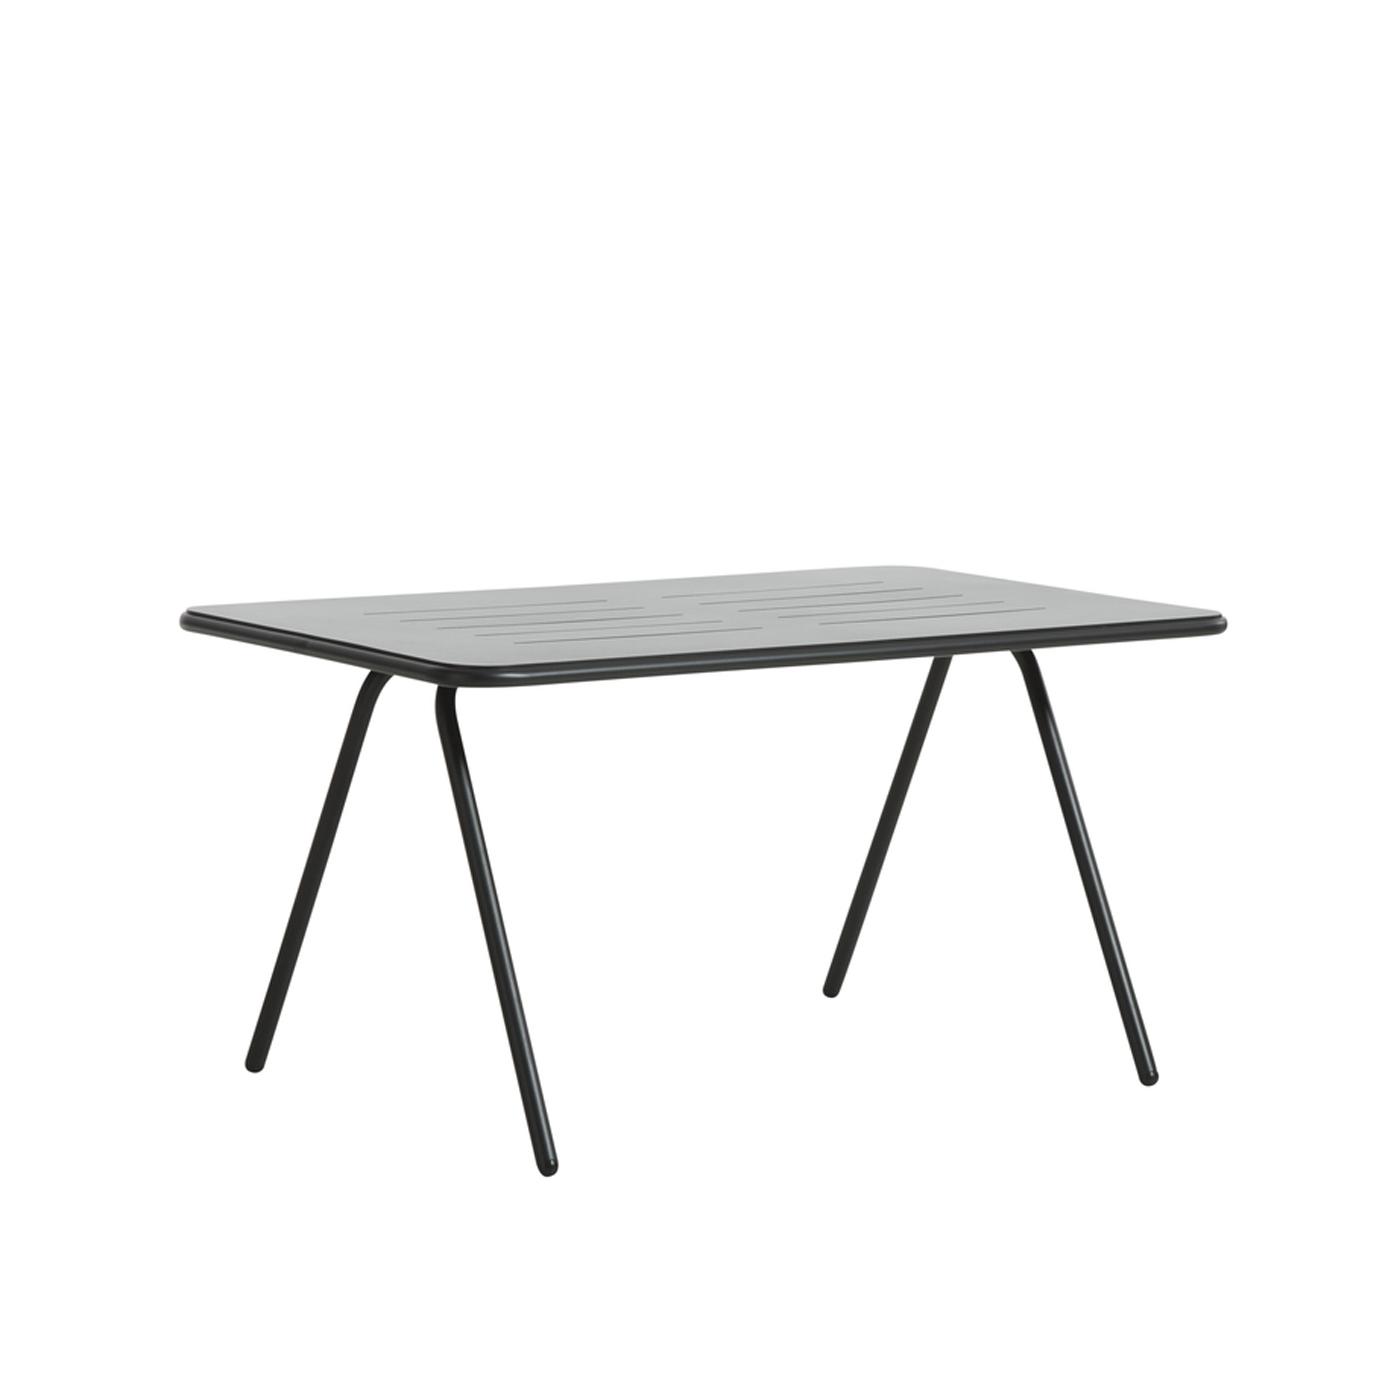 WOUD Ray spisebord - sort aluminium, raktangulær (140x85)